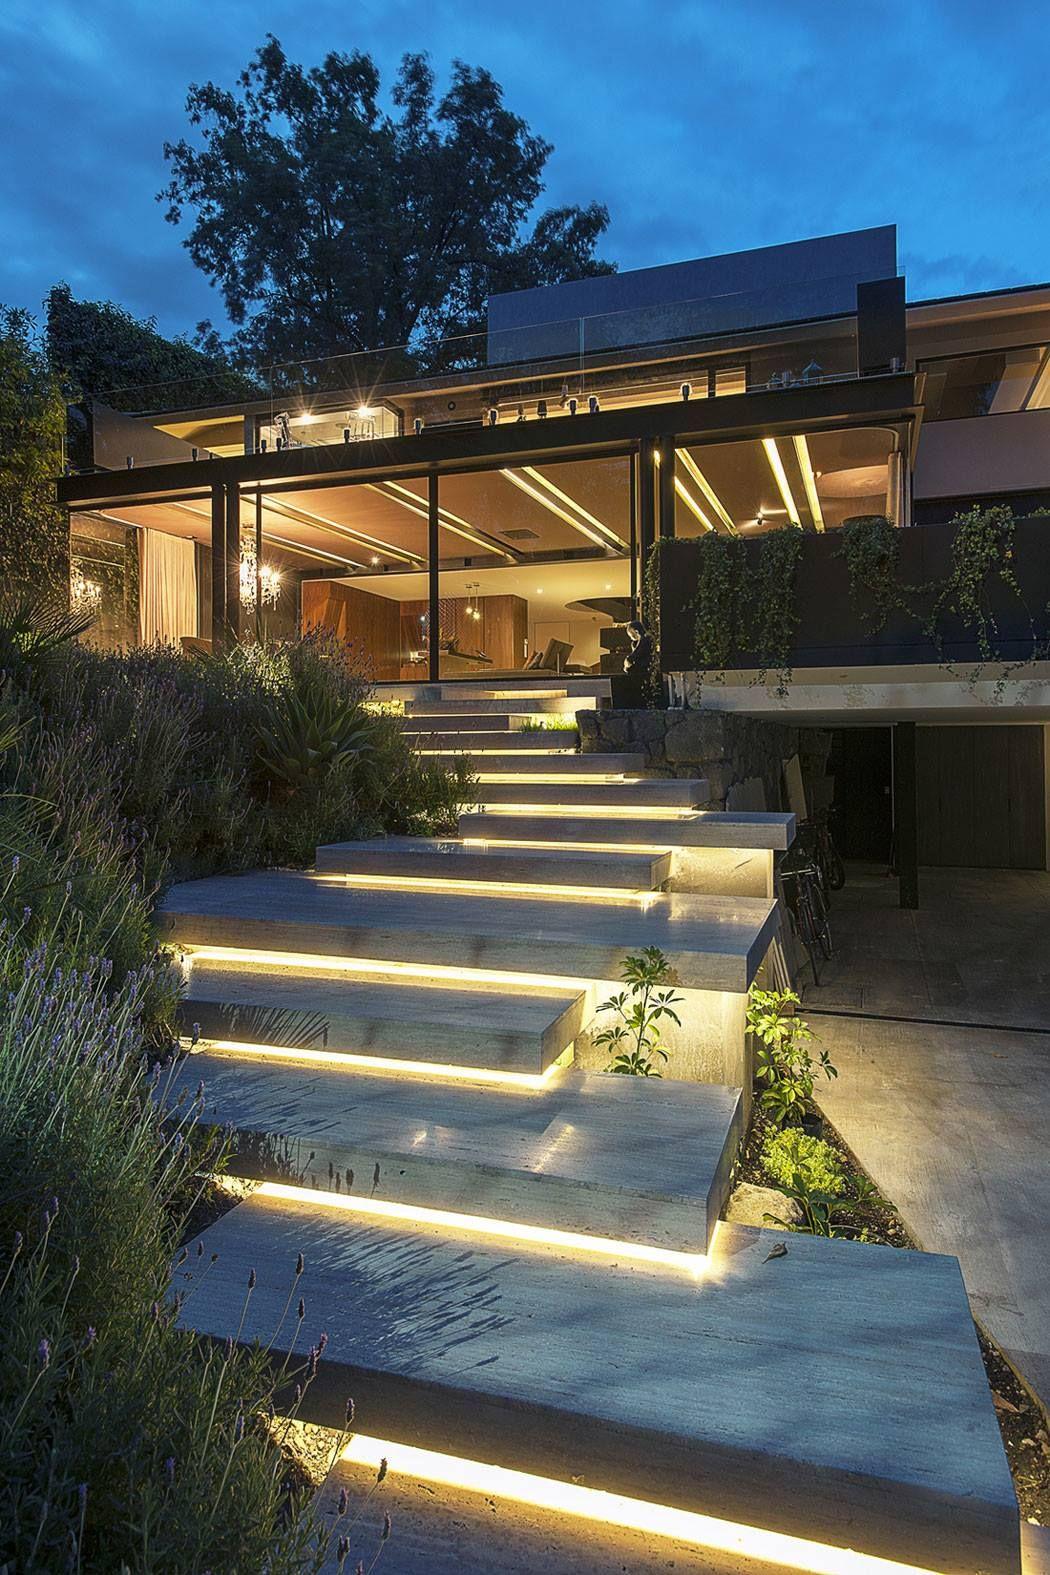 homedsgn: Casa Lomas II by Paola Calzada Arquitectos ...